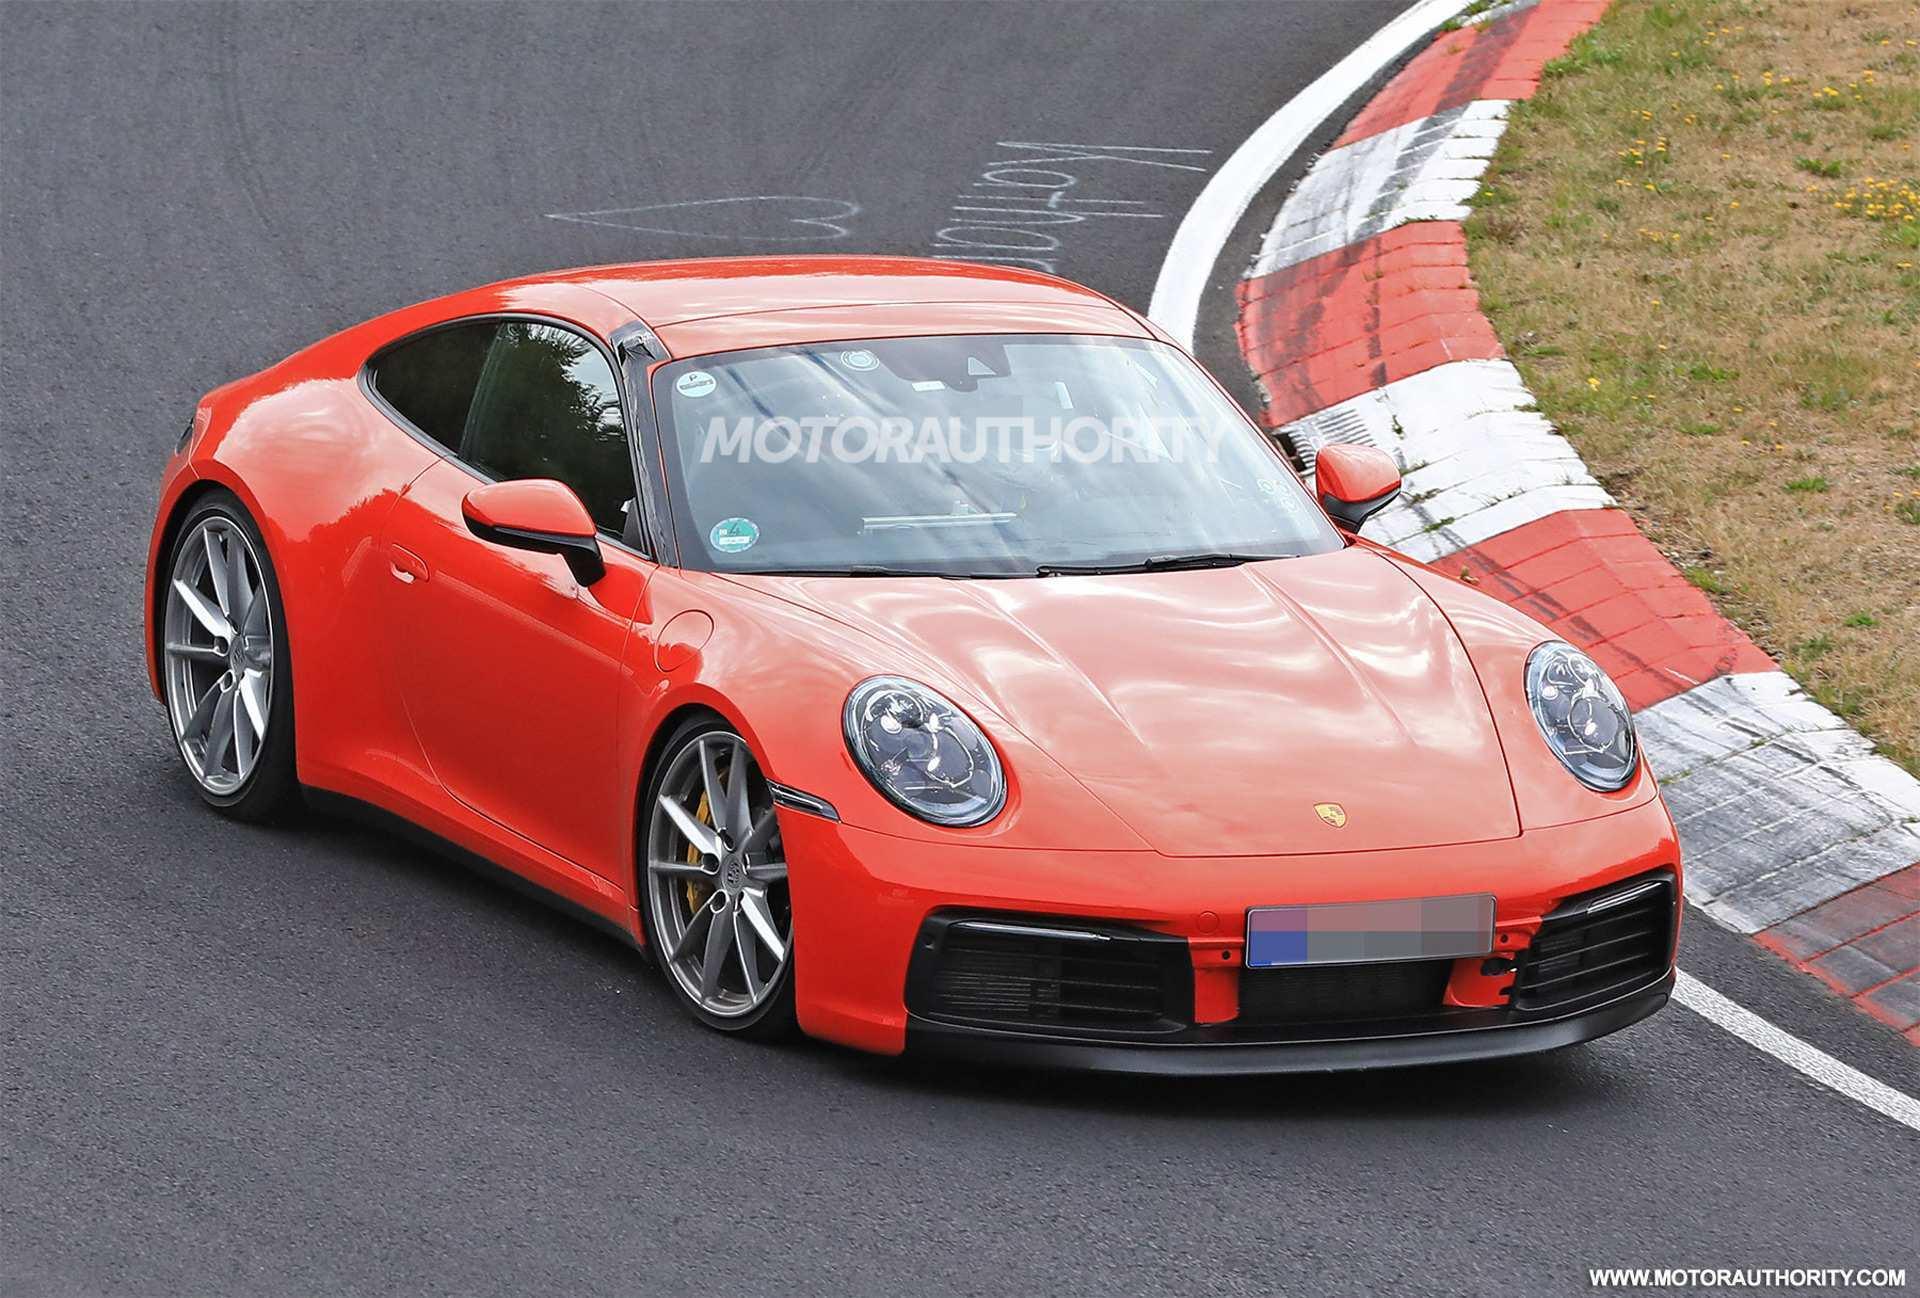 59 Best Review Porsche Modelli 2020 First Drive by Porsche Modelli 2020